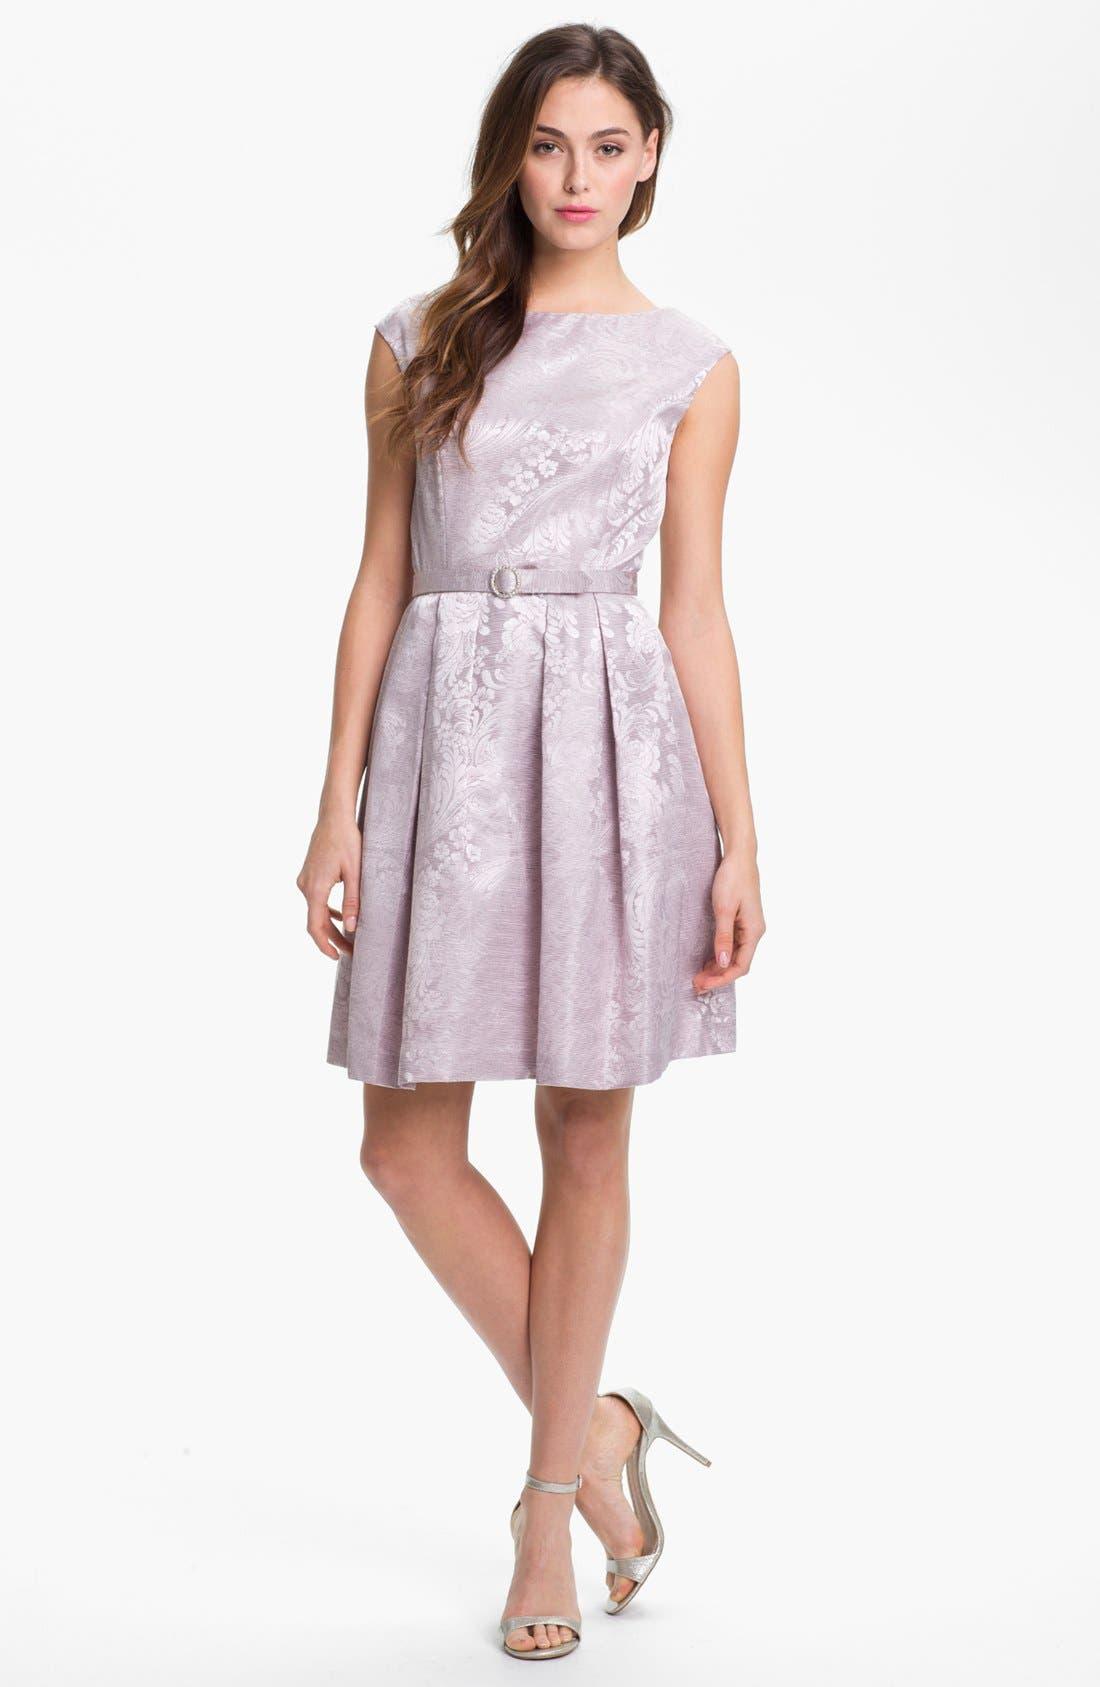 Alternate Image 1 Selected - Eliza J Textured Print Fit & Flare Dress